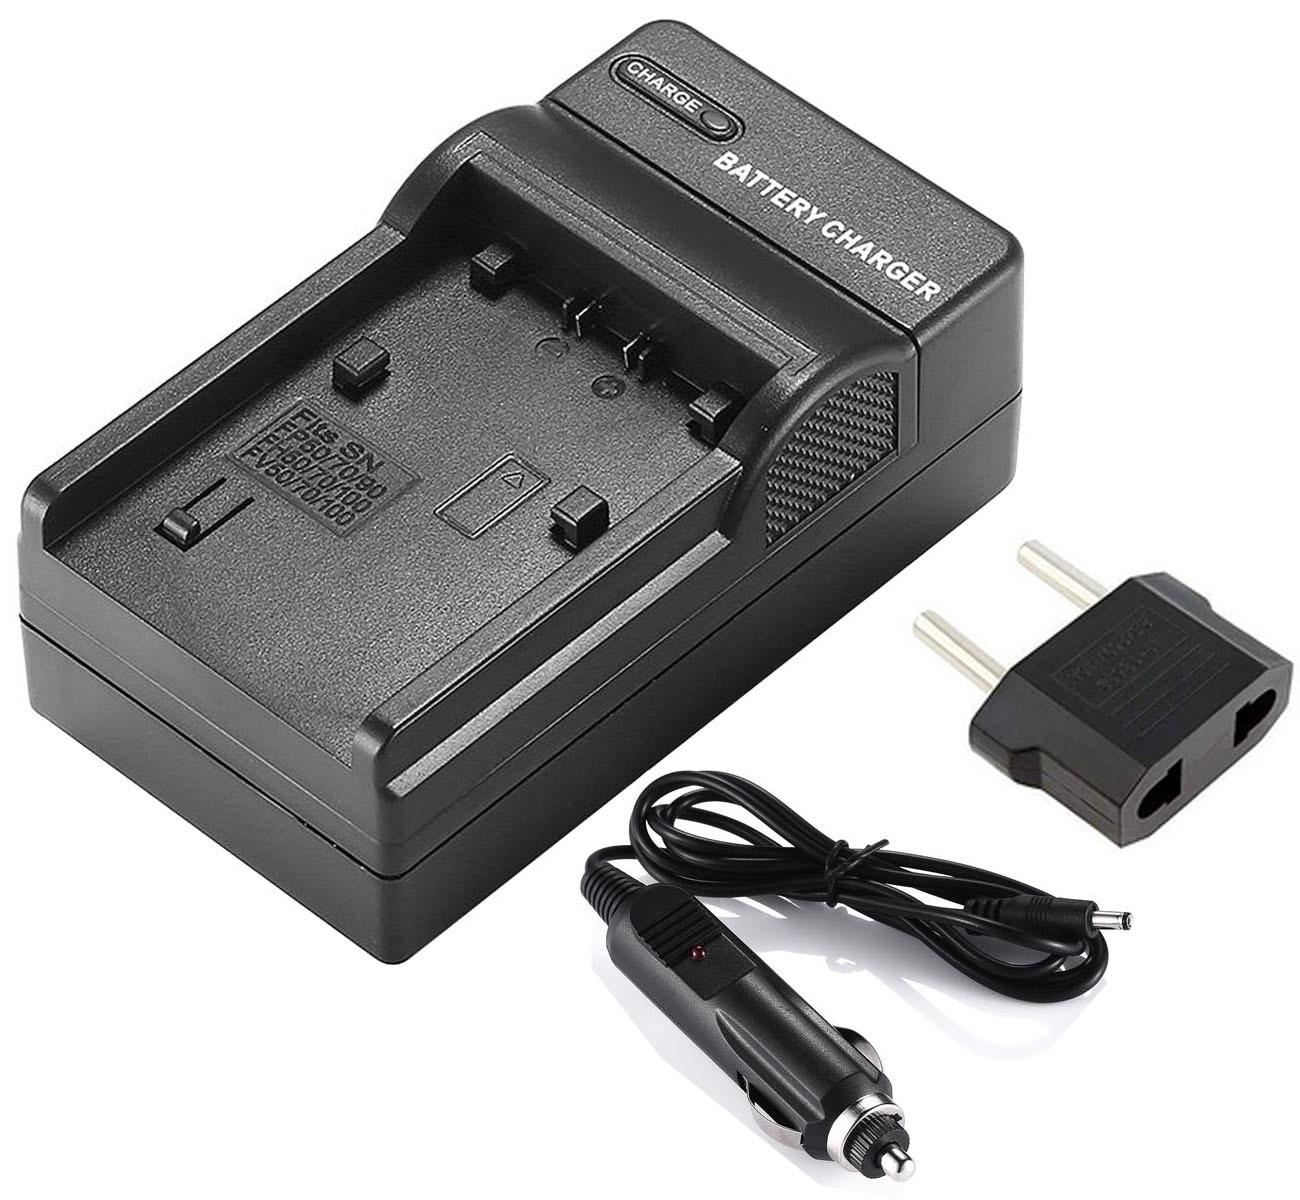 Carregador de bateria para sony HDR-CX550, HDR-CX550V, HDR-CX560, HDR-CX560V, HDR-CX570, HDR-CX580V, HDR-CX590V, handycam filmadora